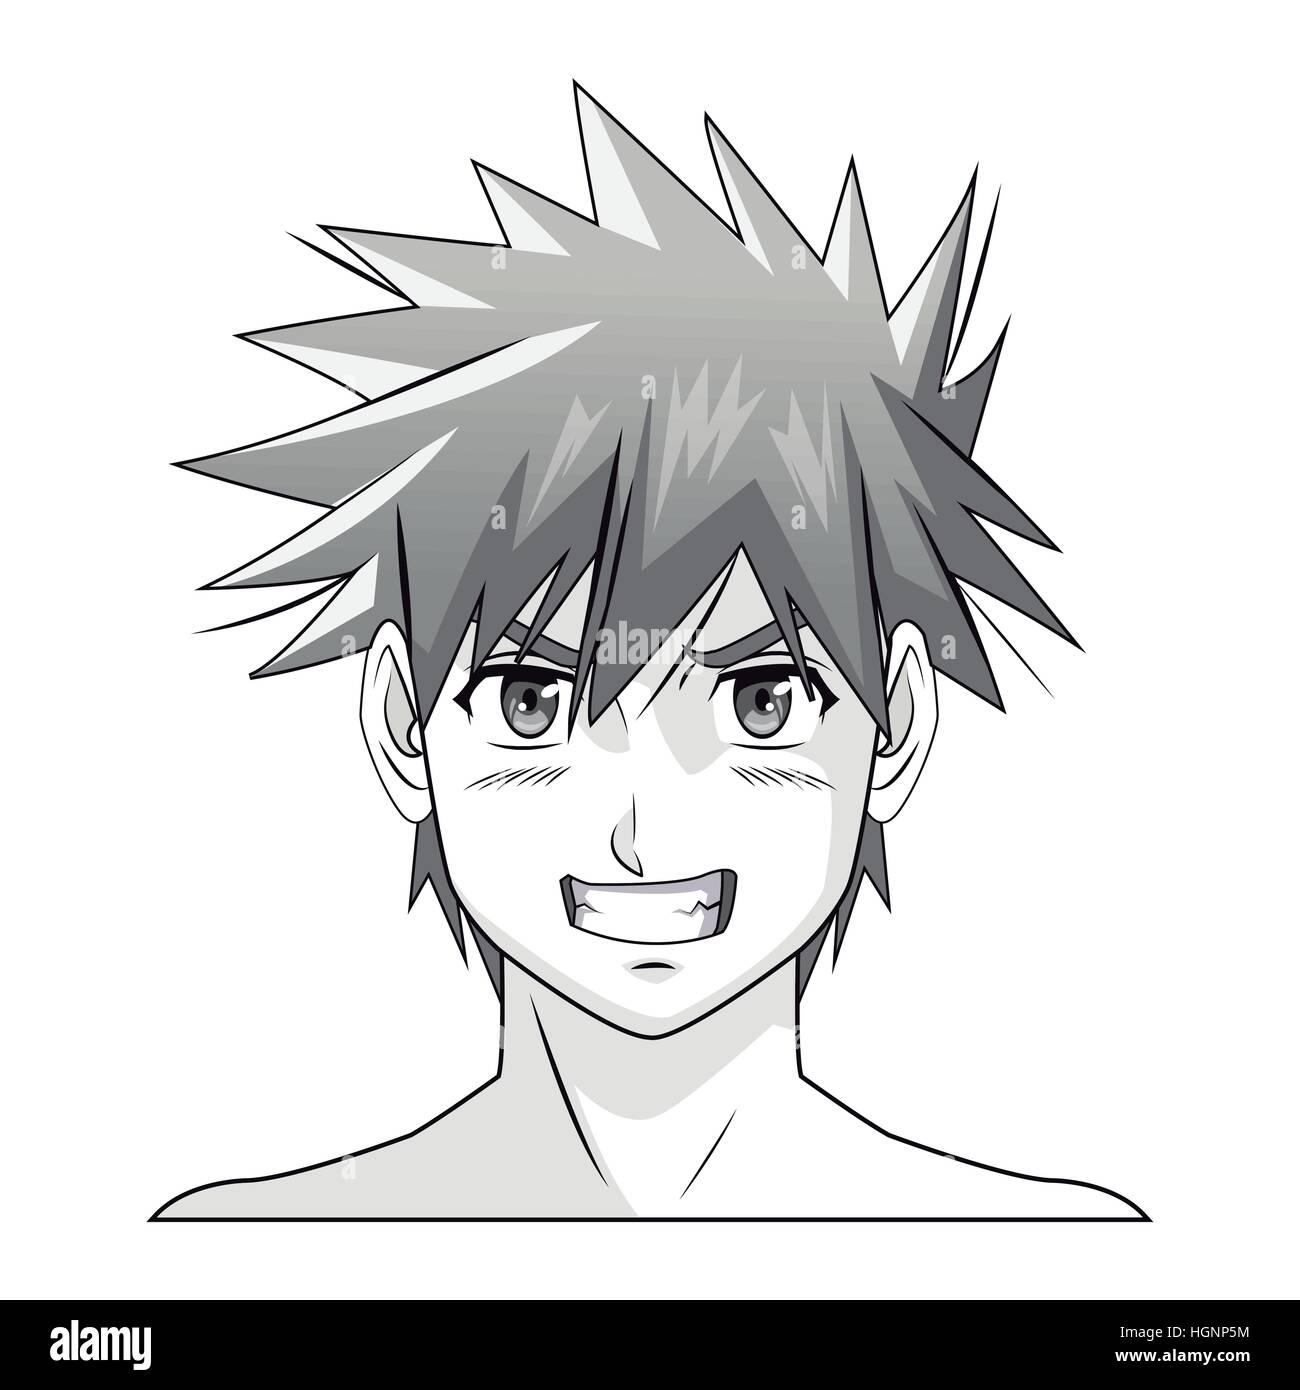 Gesicht Junge Anime Manga Comic Figur Vektor Abbildung